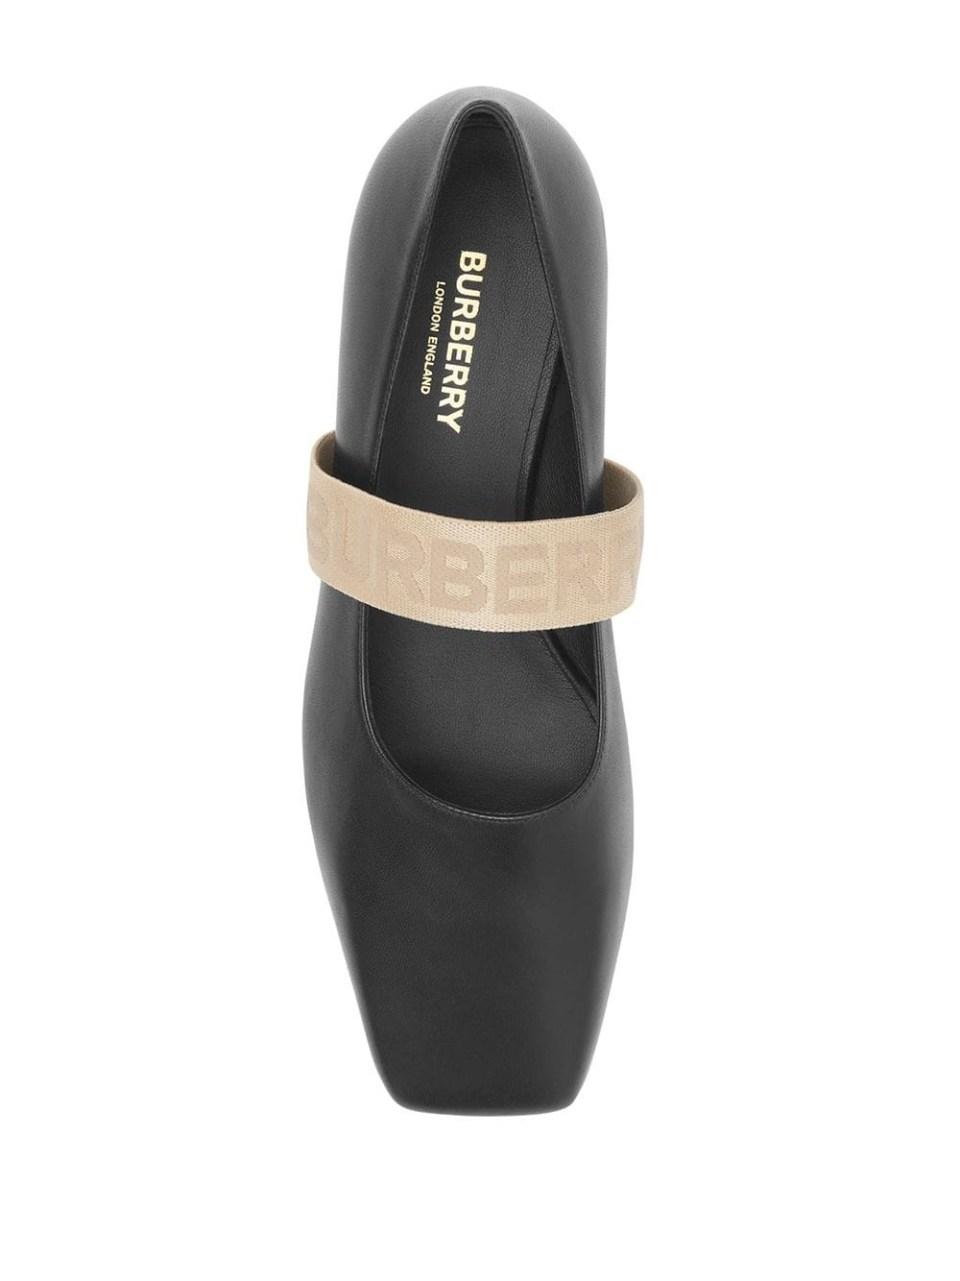 Burberry Туфли на плоской подошве с логотипом